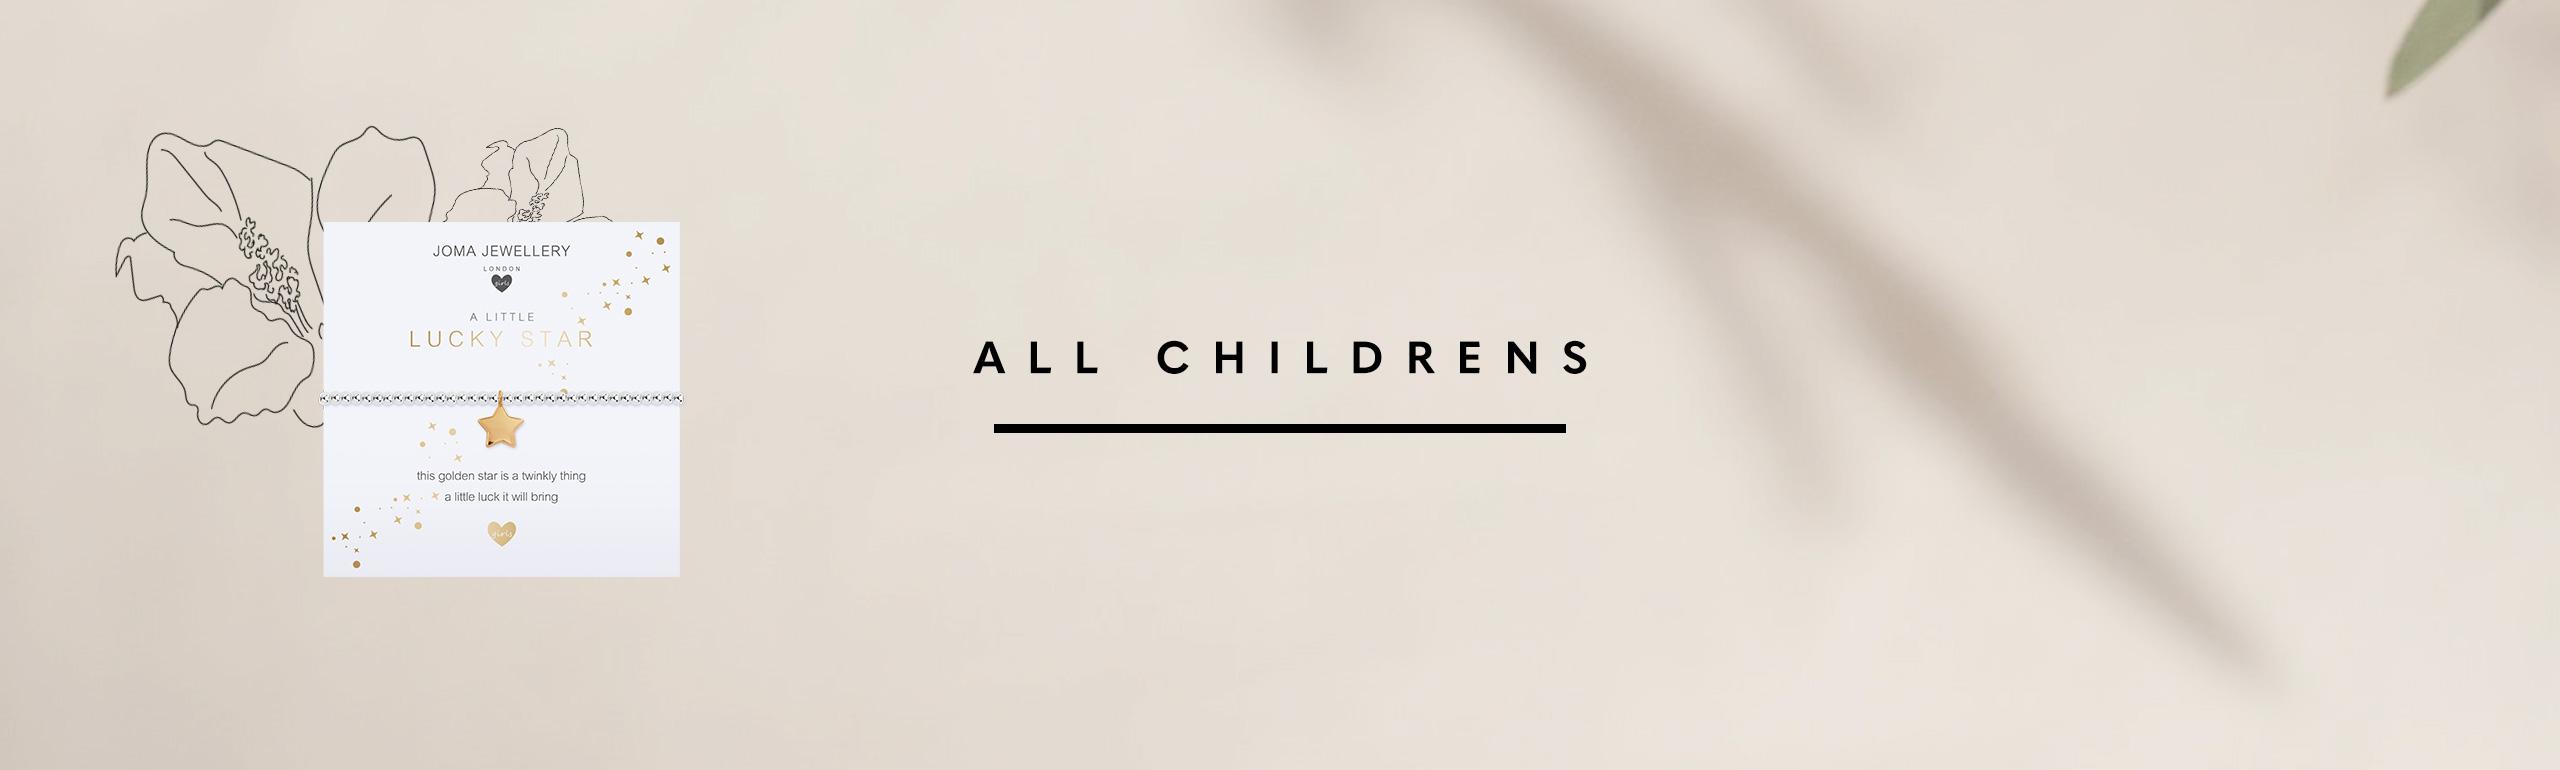 All Children's Jewellery